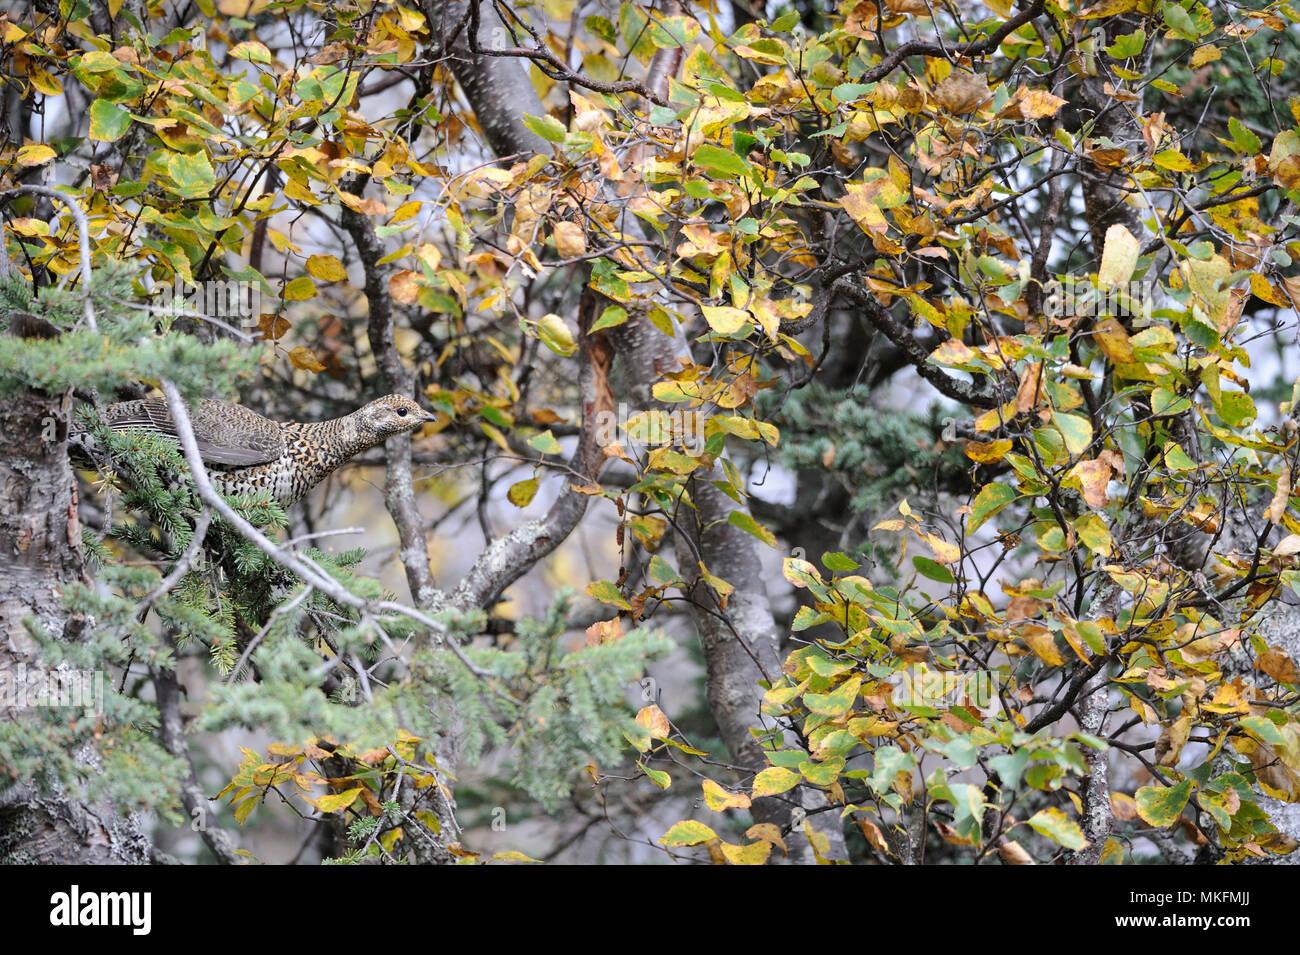 Spruce Grouse (Falcipennis canadensis) on a branch, Katmai National park, Alaska, USA - Stock Image